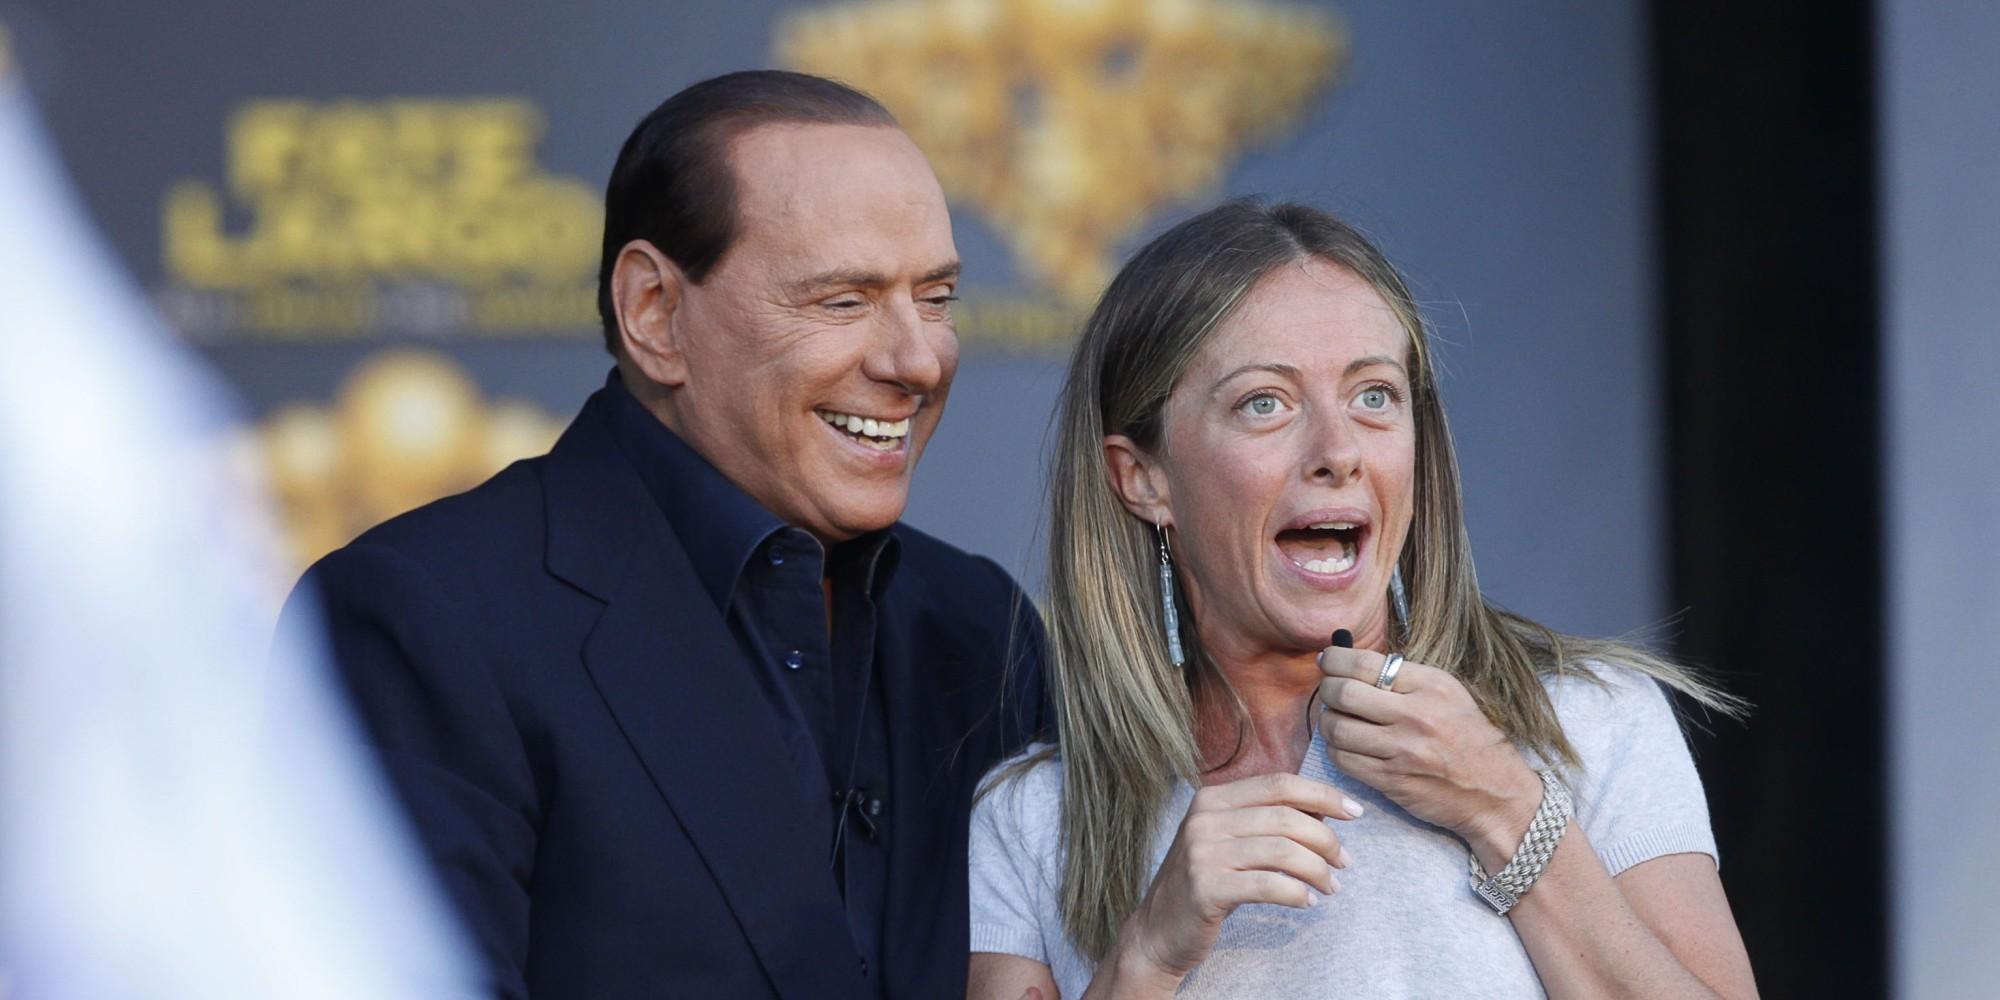 Comunali, Meloni a Berlusconi: